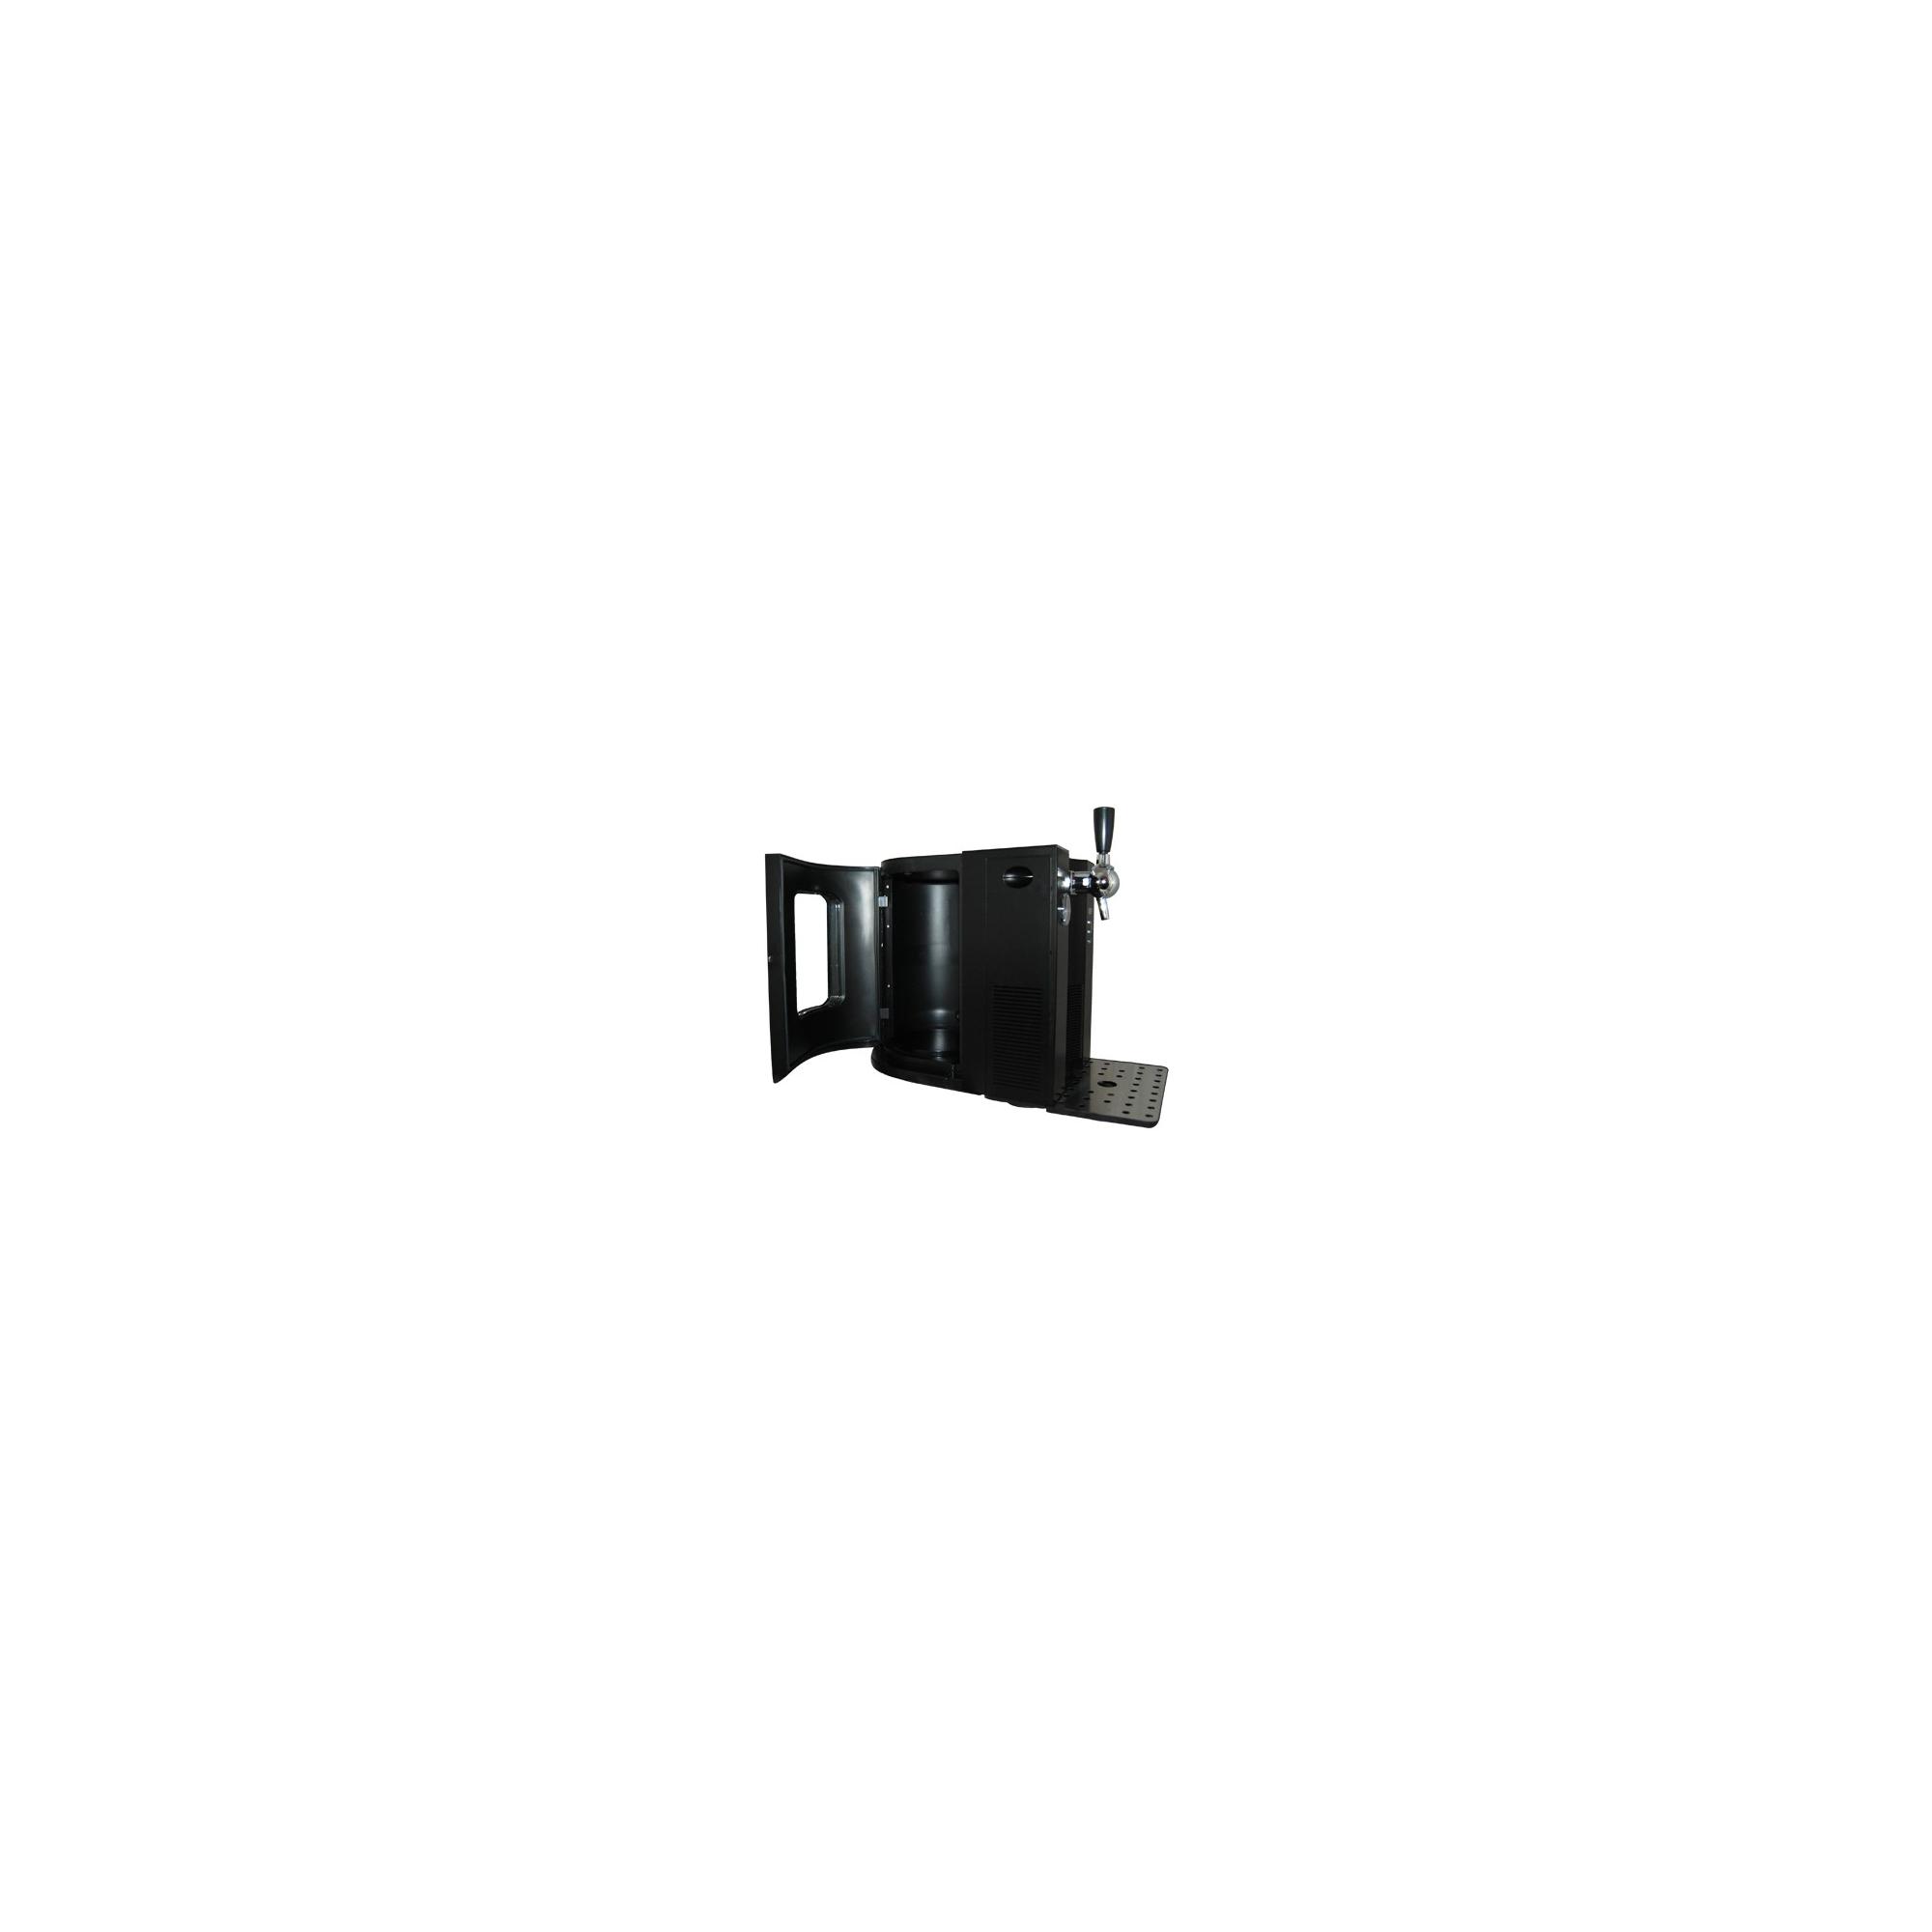 machine bi re fagor pres 05 tireuse compatible f ts de 5l beertender. Black Bedroom Furniture Sets. Home Design Ideas